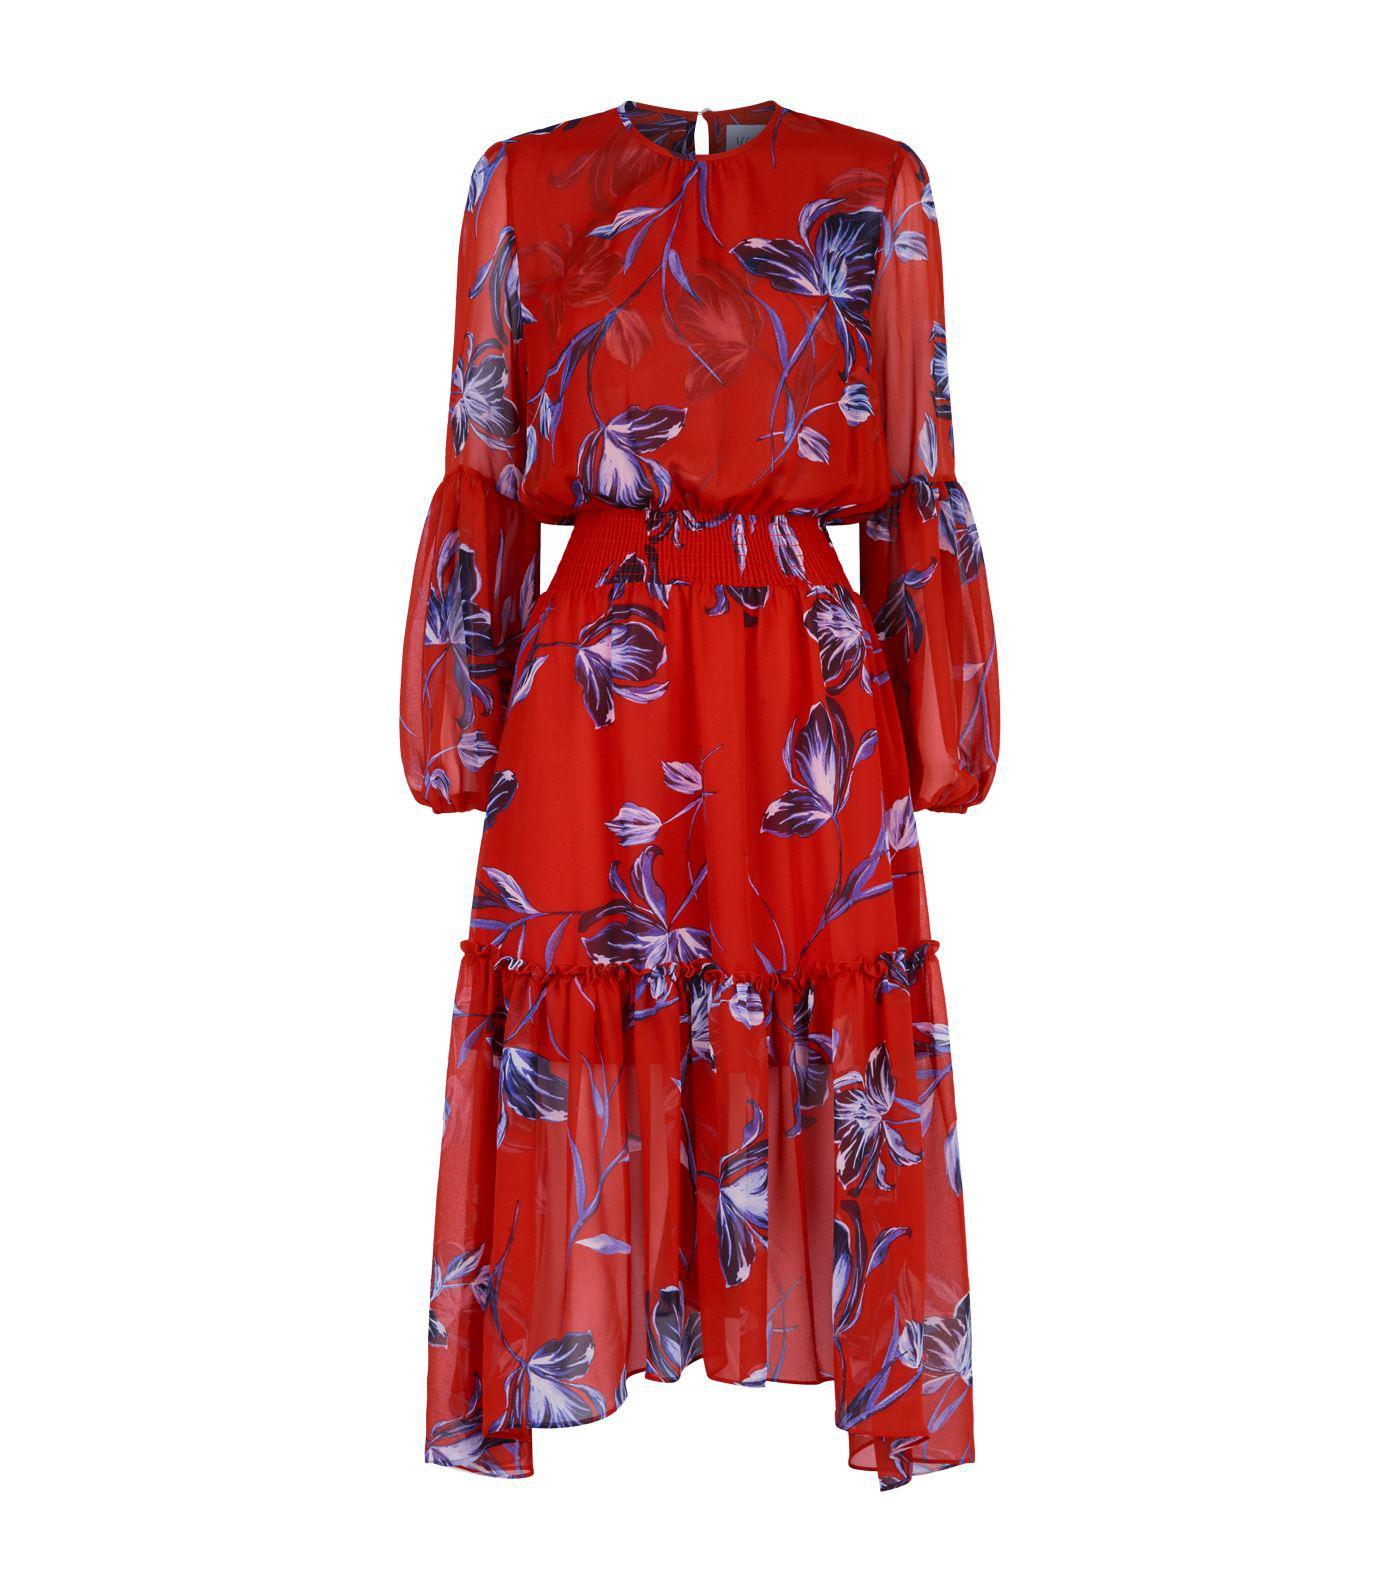 5a9ddd61769b0f MISA Simone Floral Midi Dress in Red - Lyst